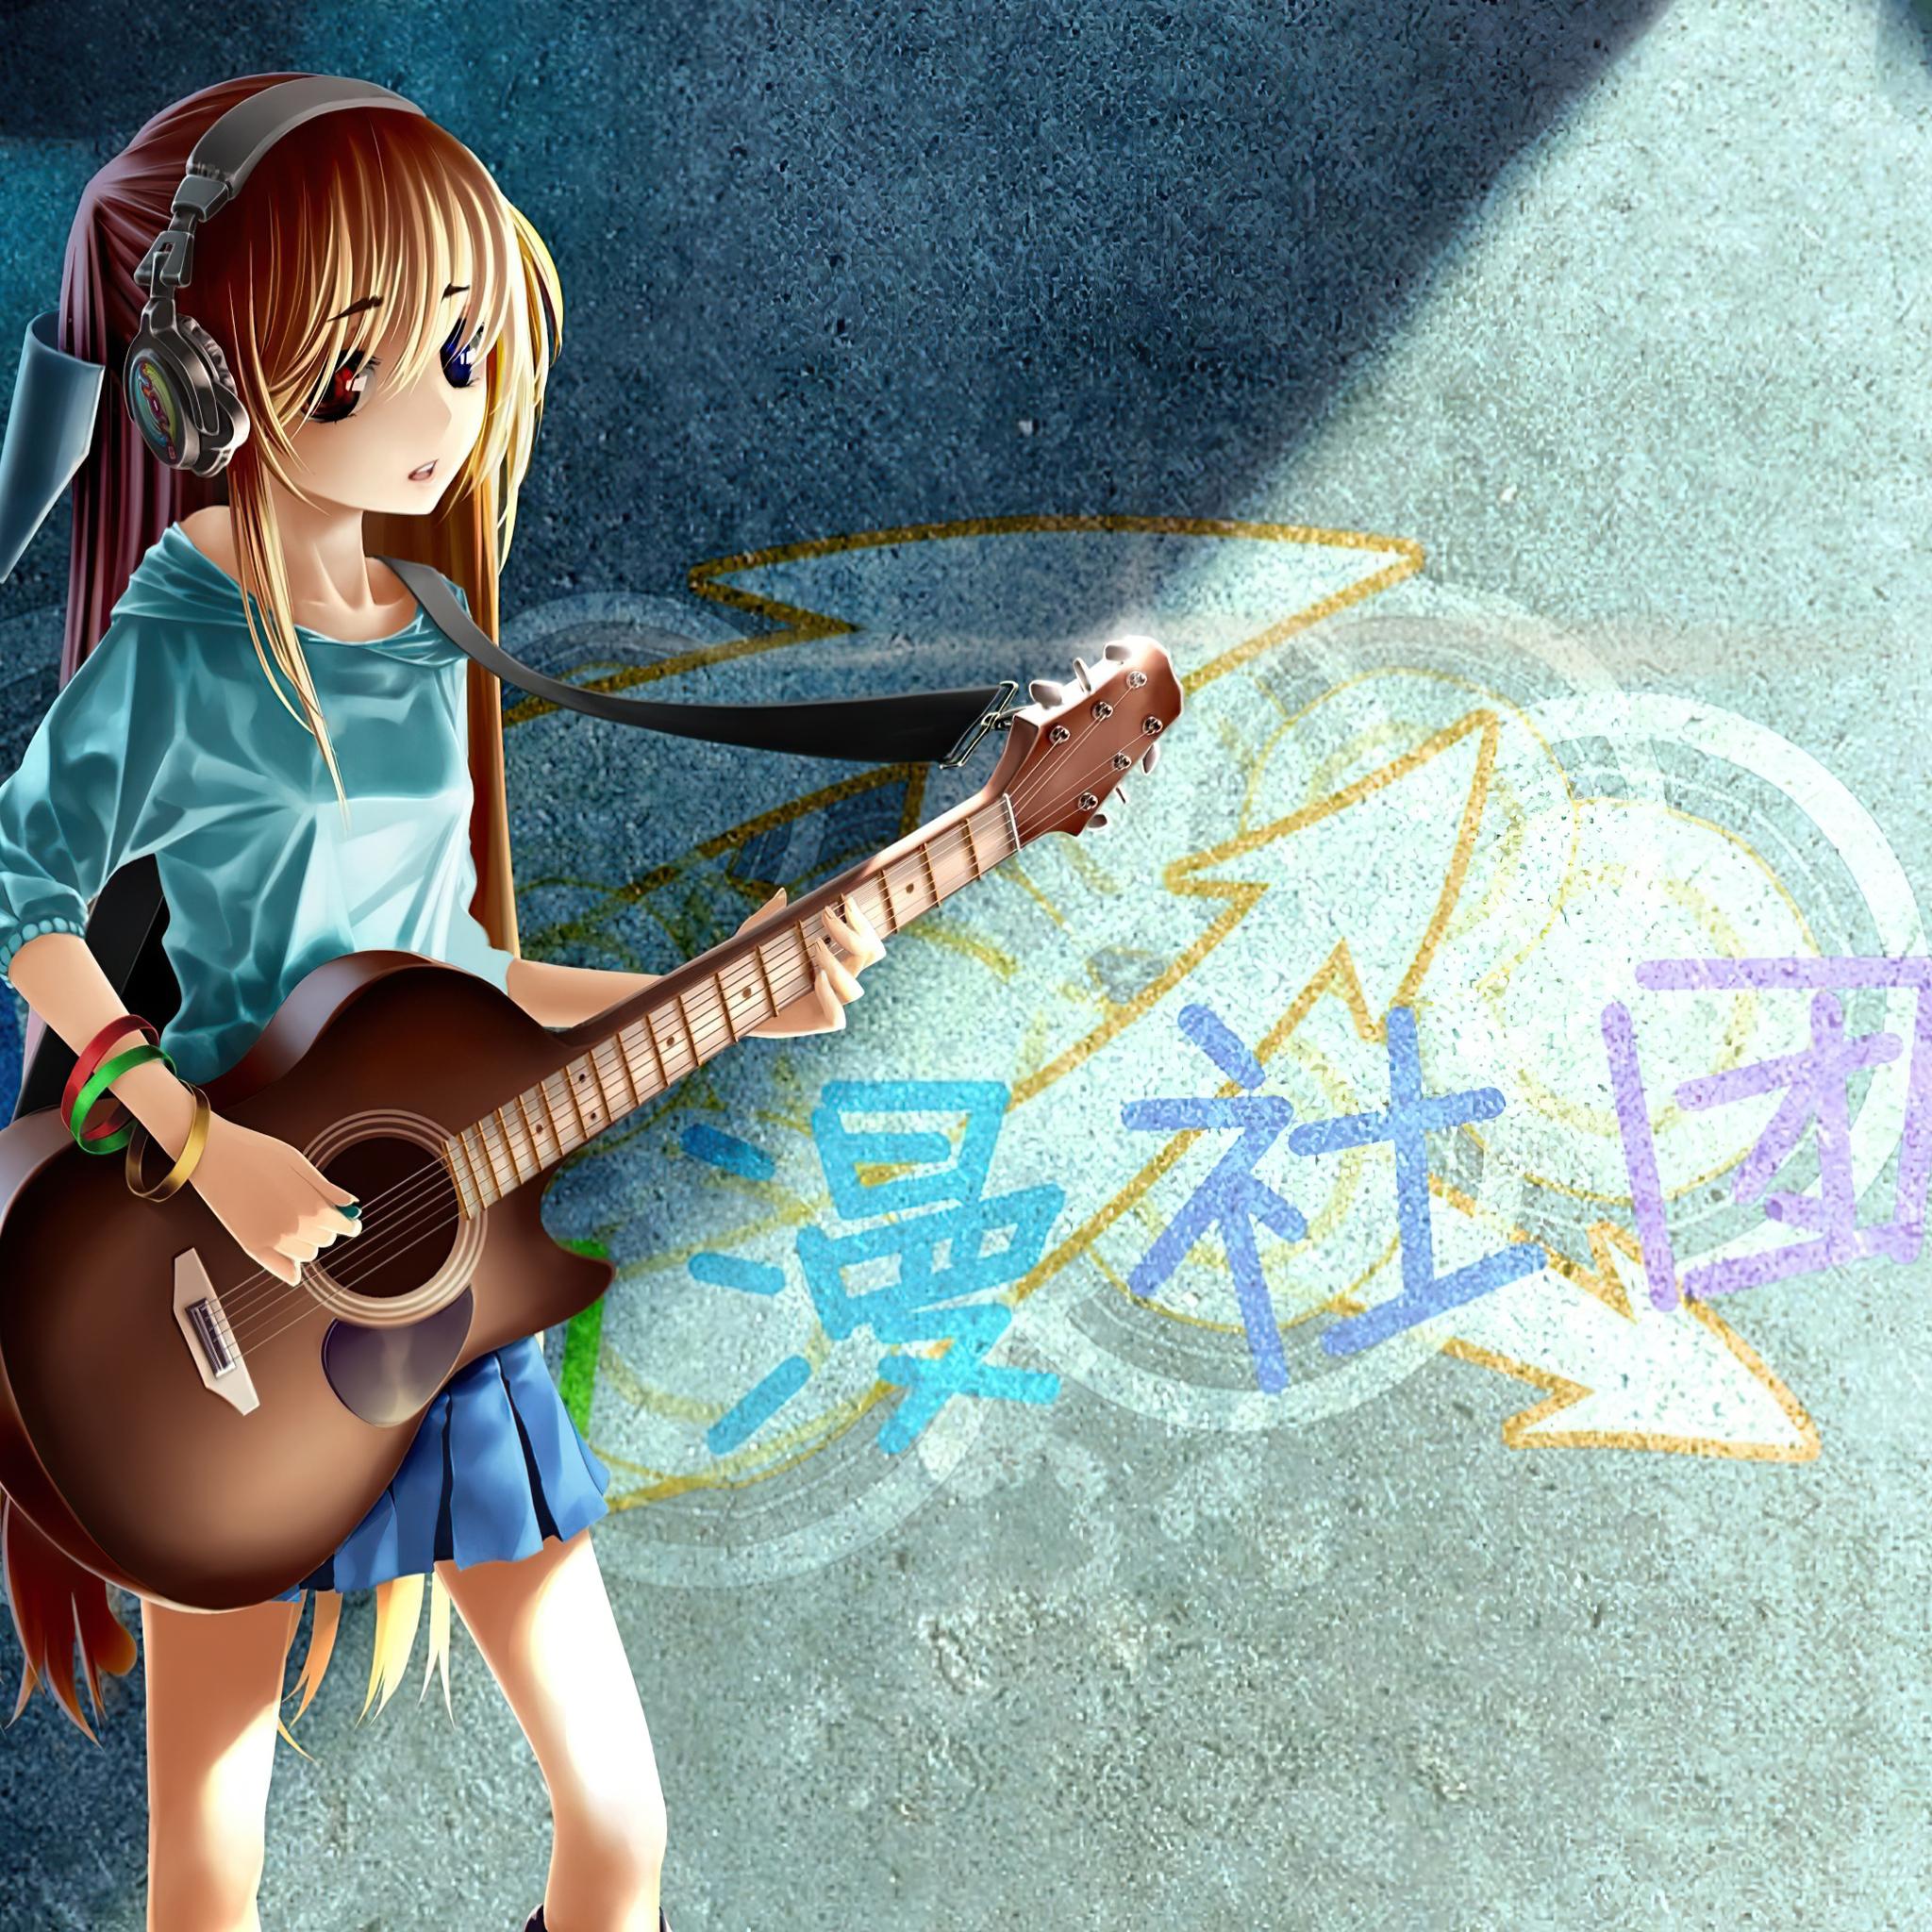 2048x2048 Anime Girl Guitar Grafitti 4k Ipad Air HD 4k ...